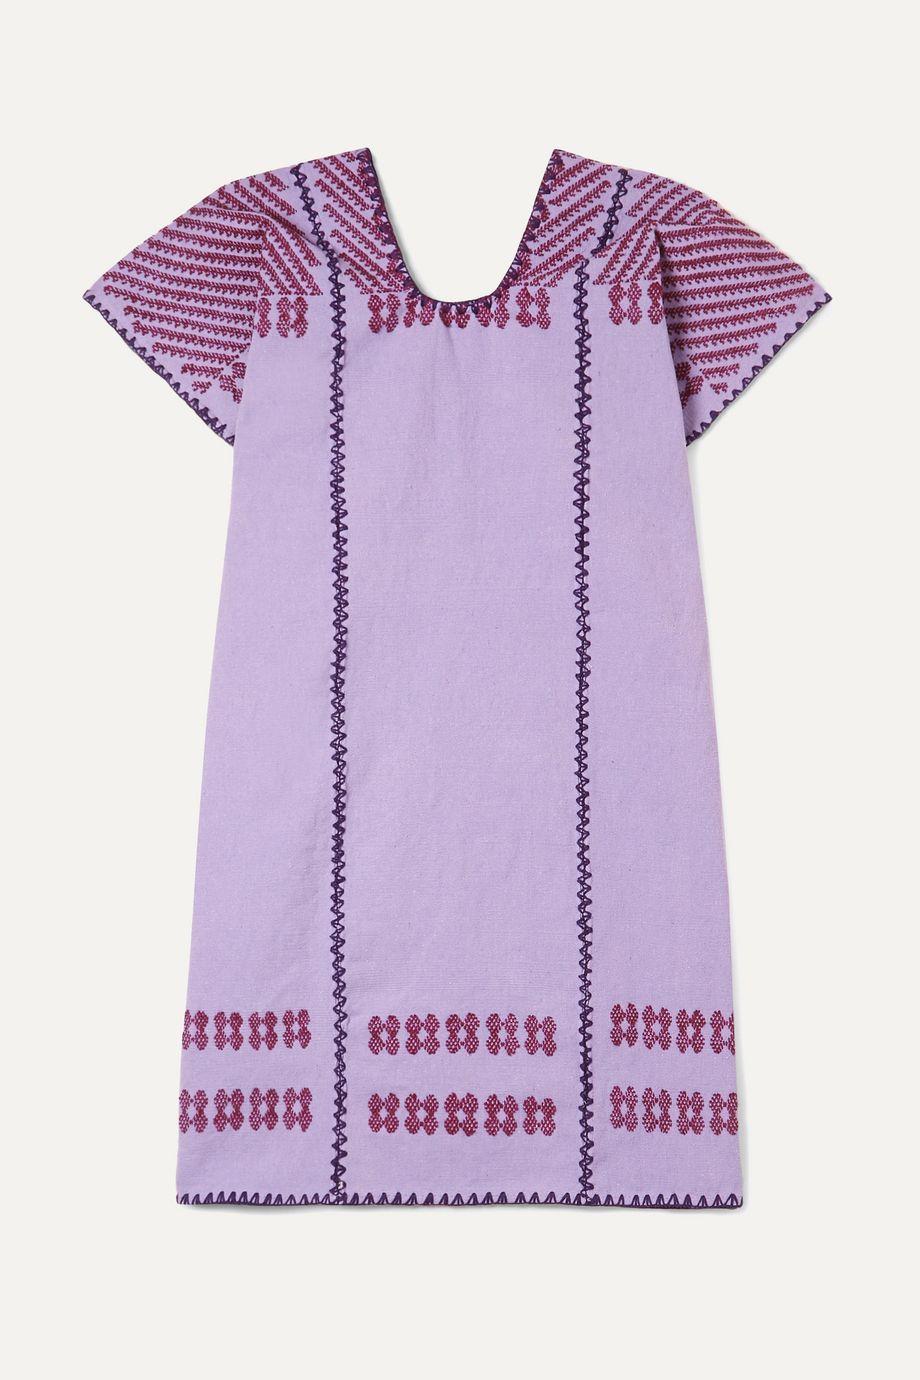 Pippa Holt Kids Embroidered cotton kaftan